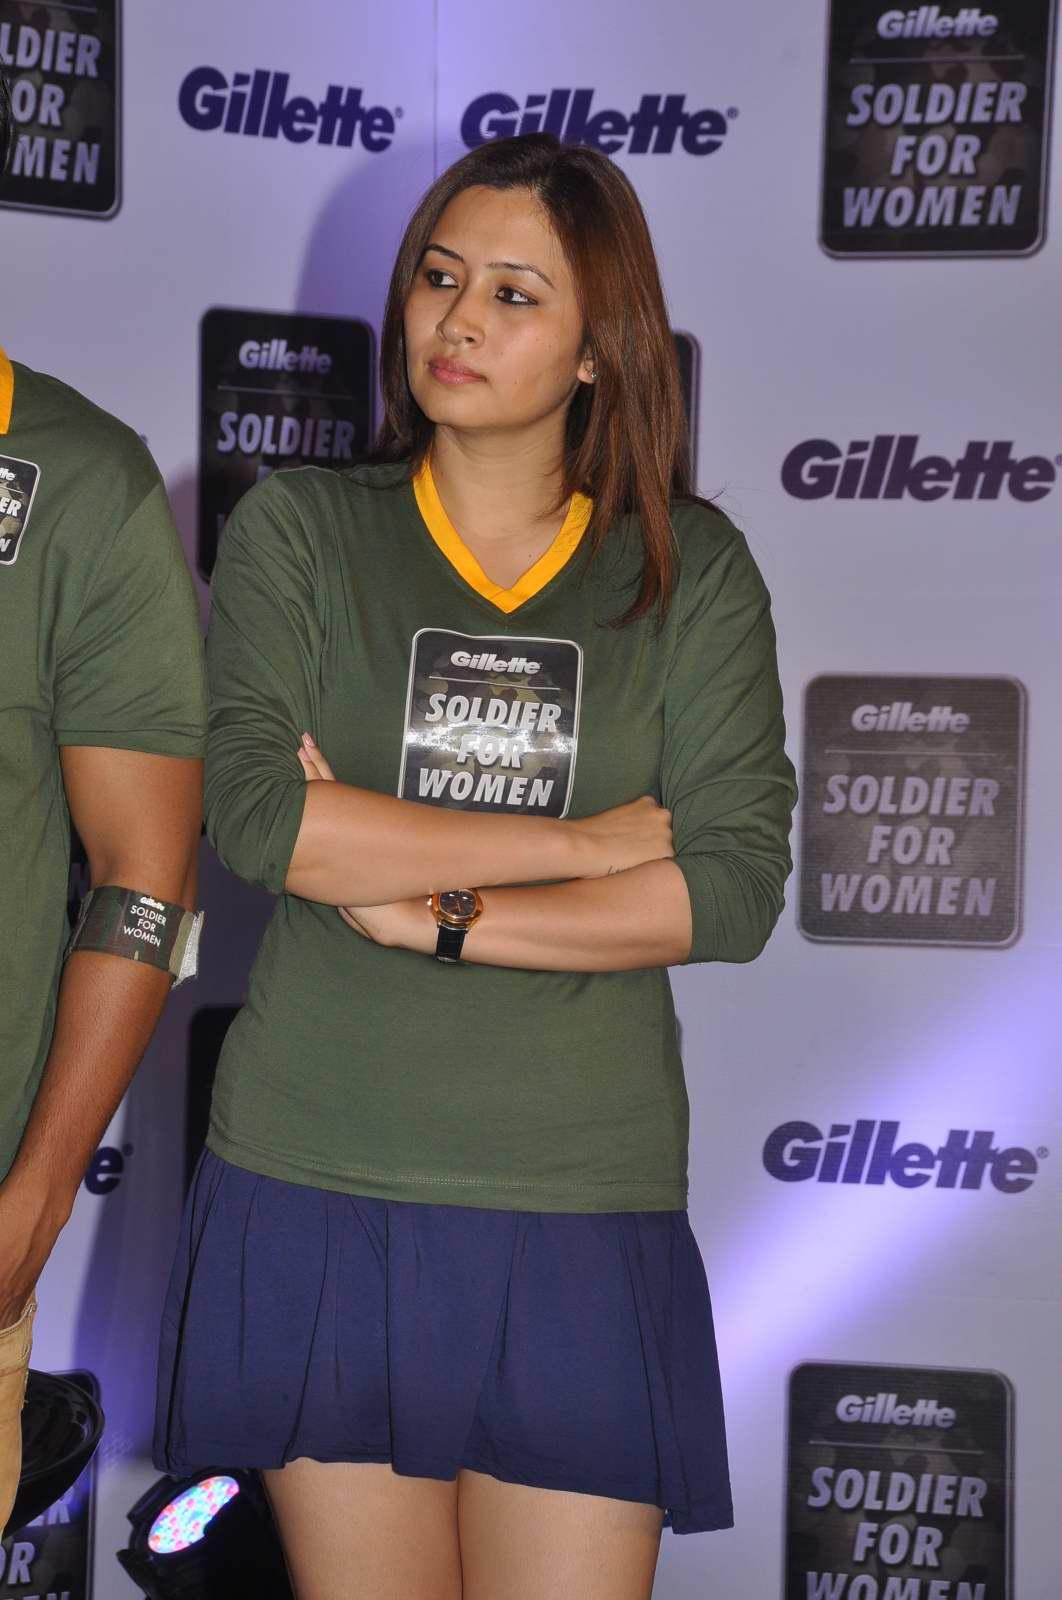 Jwala gutta latest photos at gillette event